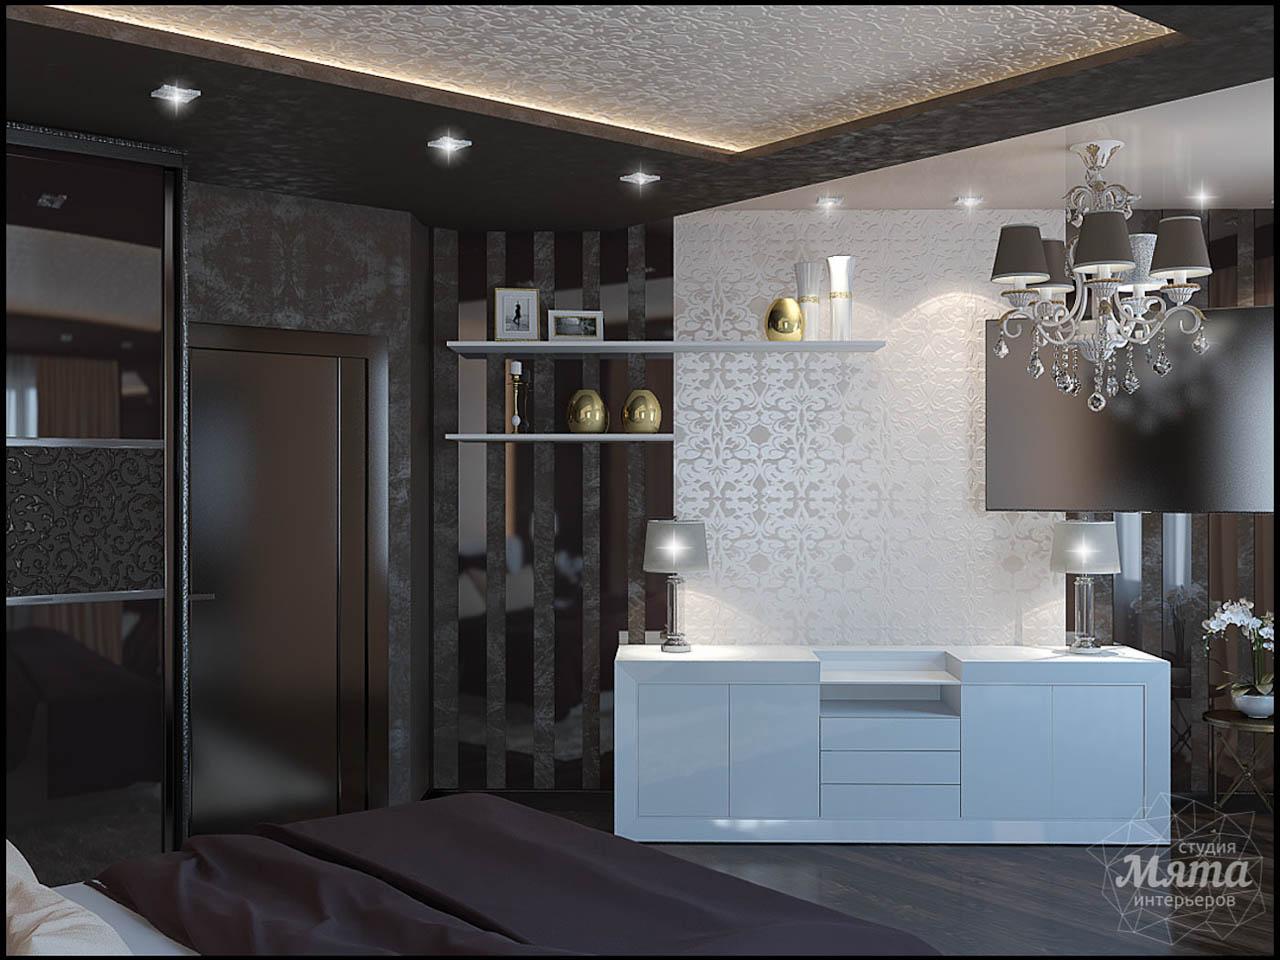 Дизайн интерьера и ремонт трехкомнатной квартиры по ул. 8 Марта 190 img1888342702